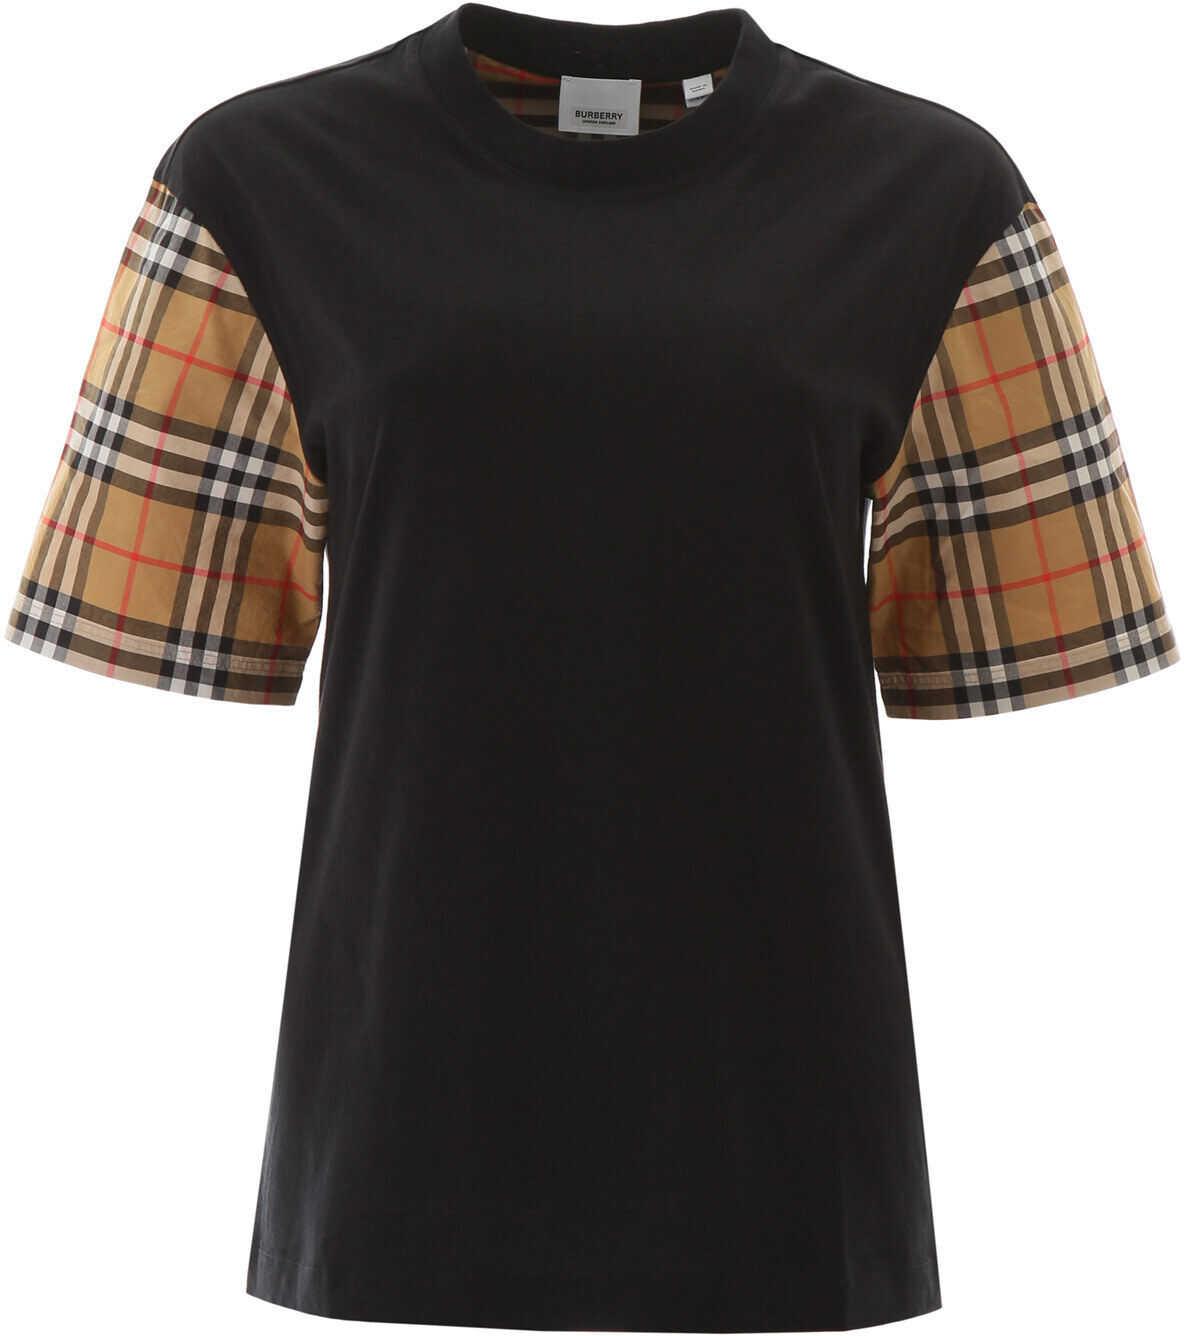 Burberry Serra T-Shirt BLACK